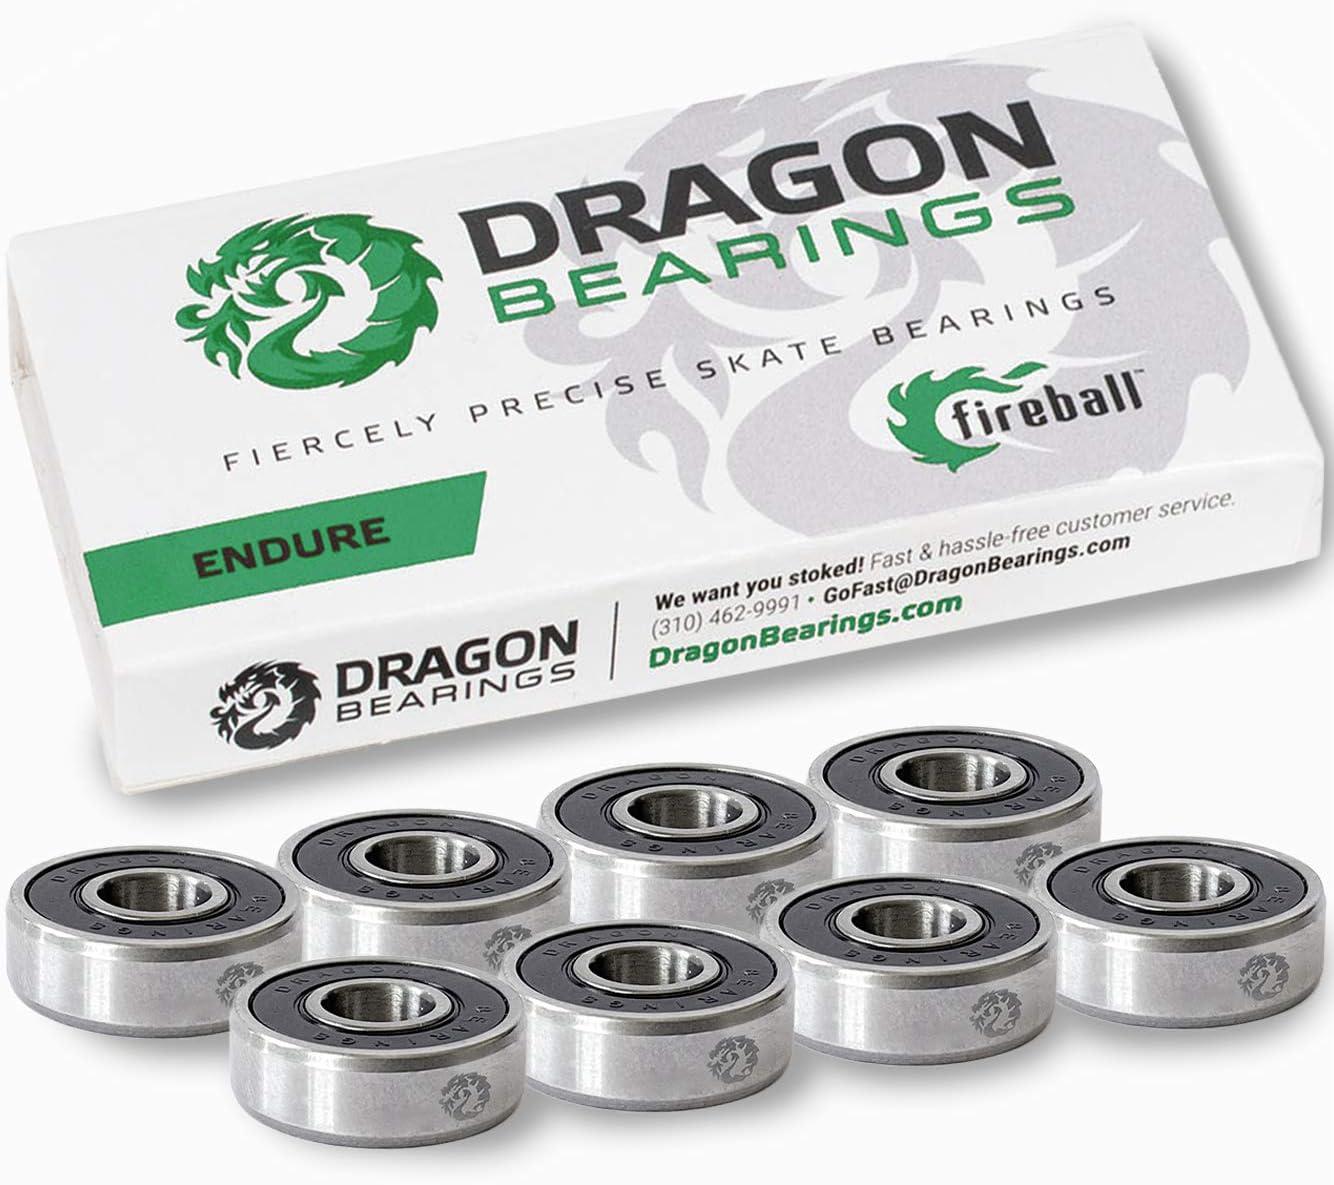 Fireball Dragon Precision Skateboard Bearings